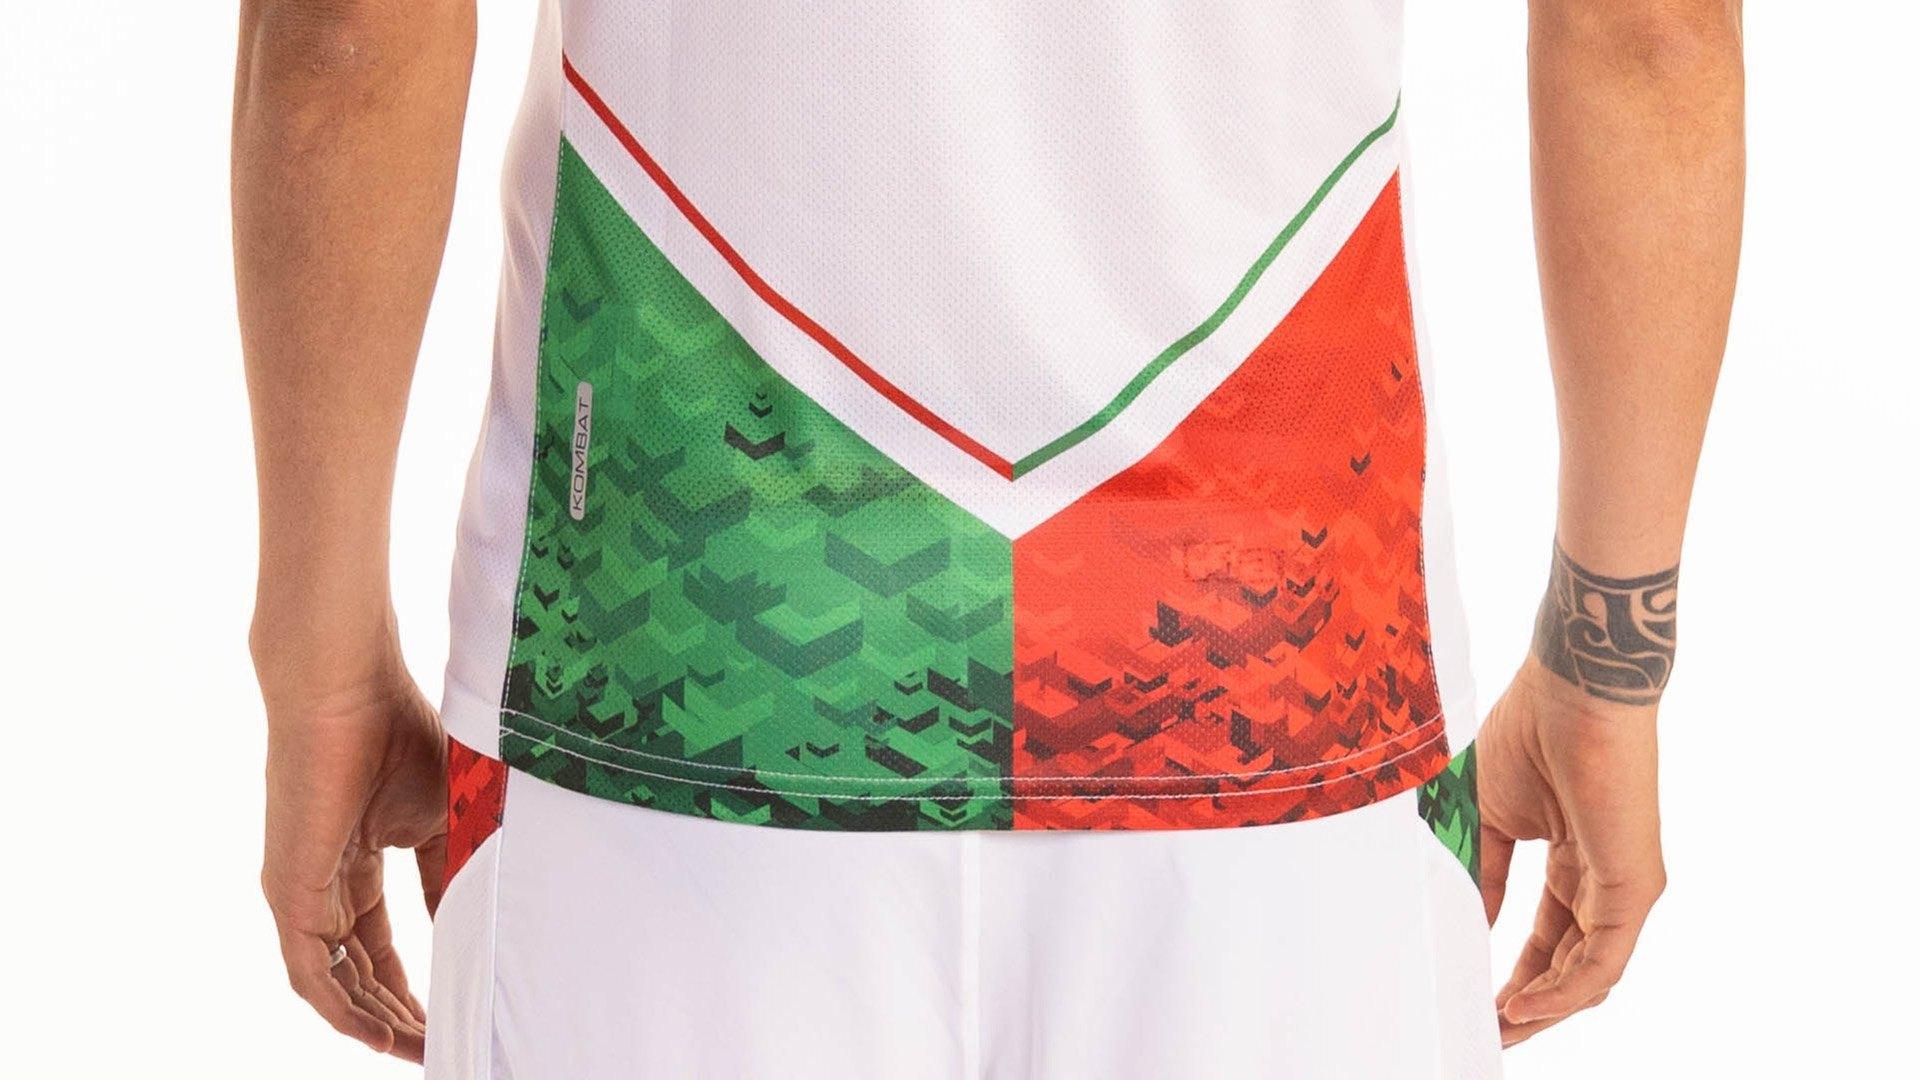 Camiseta italiana Kappa de Vélez Sarsfield 2020 | Imagen Twitter Oficial